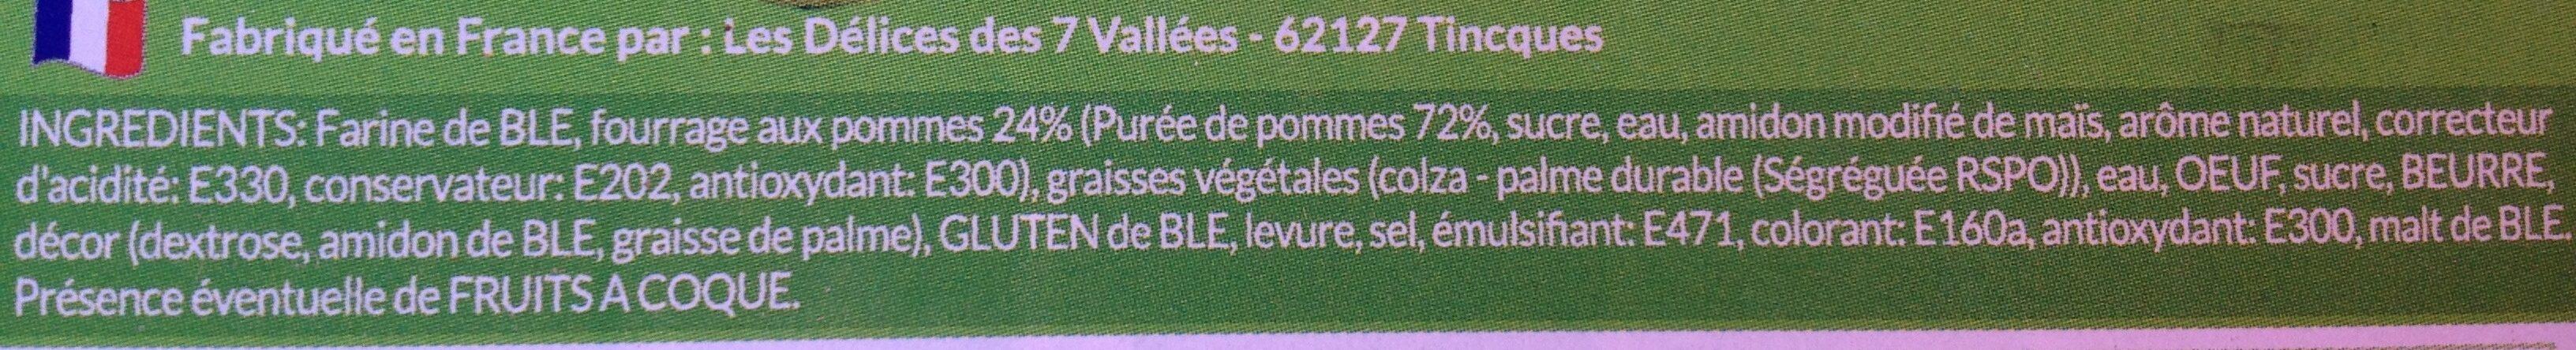 Mini-beignets fourrés aux pommes - Ingrediënten - fr